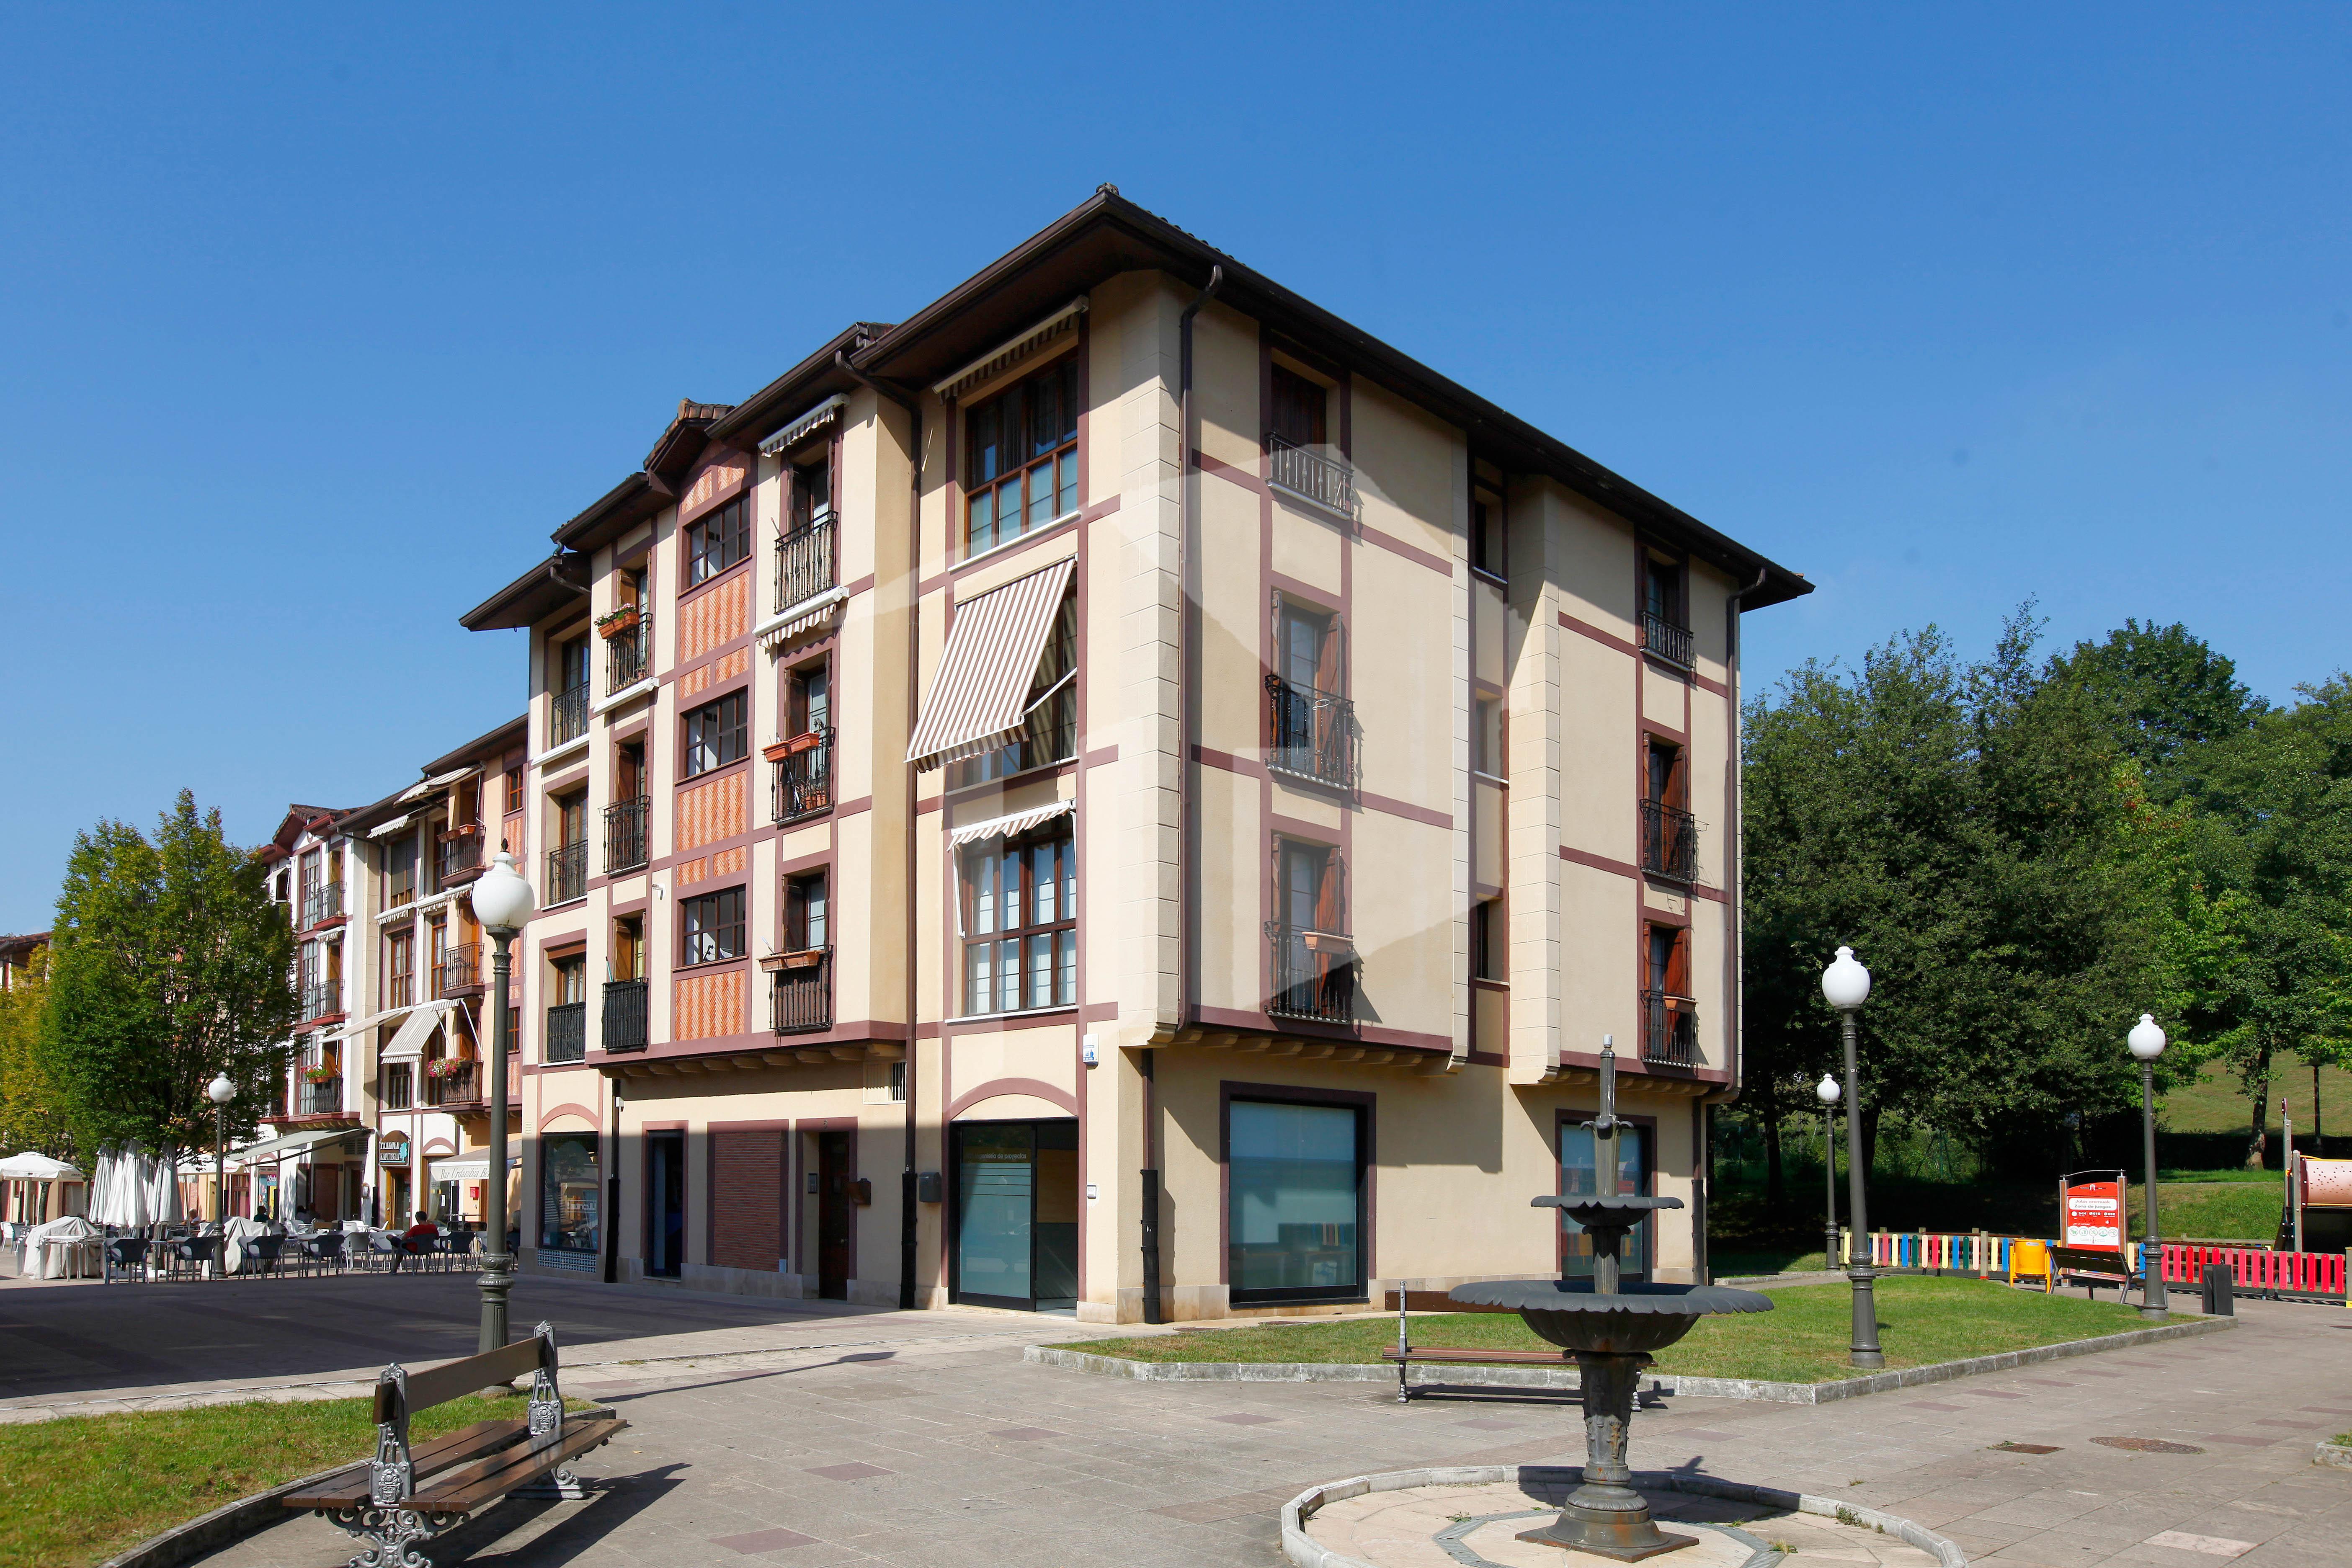 Bonito piso de 95 m2, situado en la Plaza Eihera de Urdanibia Berri.. IMPECABLE